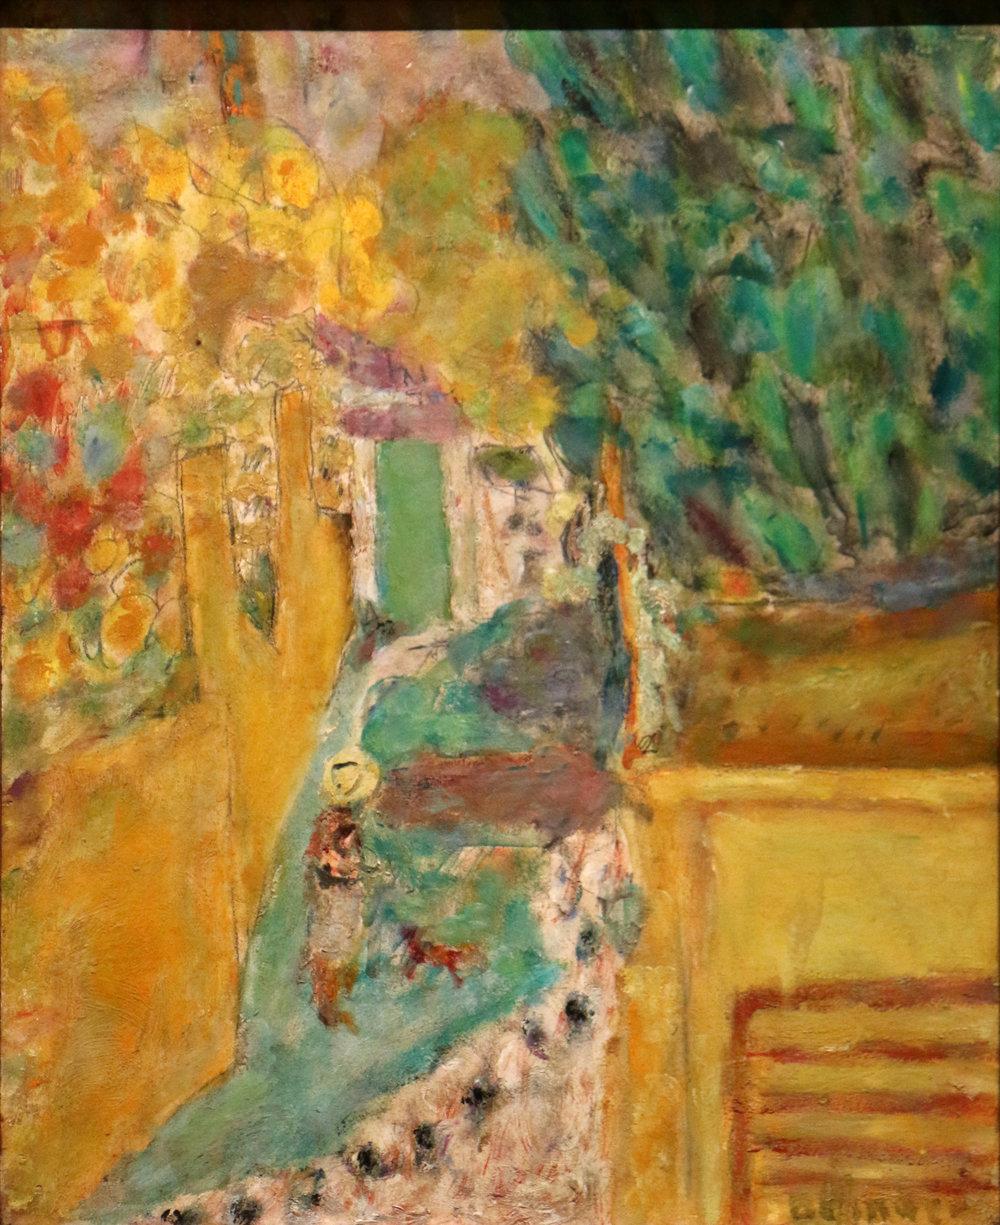 Pierre Bonnard,  L'escalier du Cannet, Musée Granet, wikimedia.org